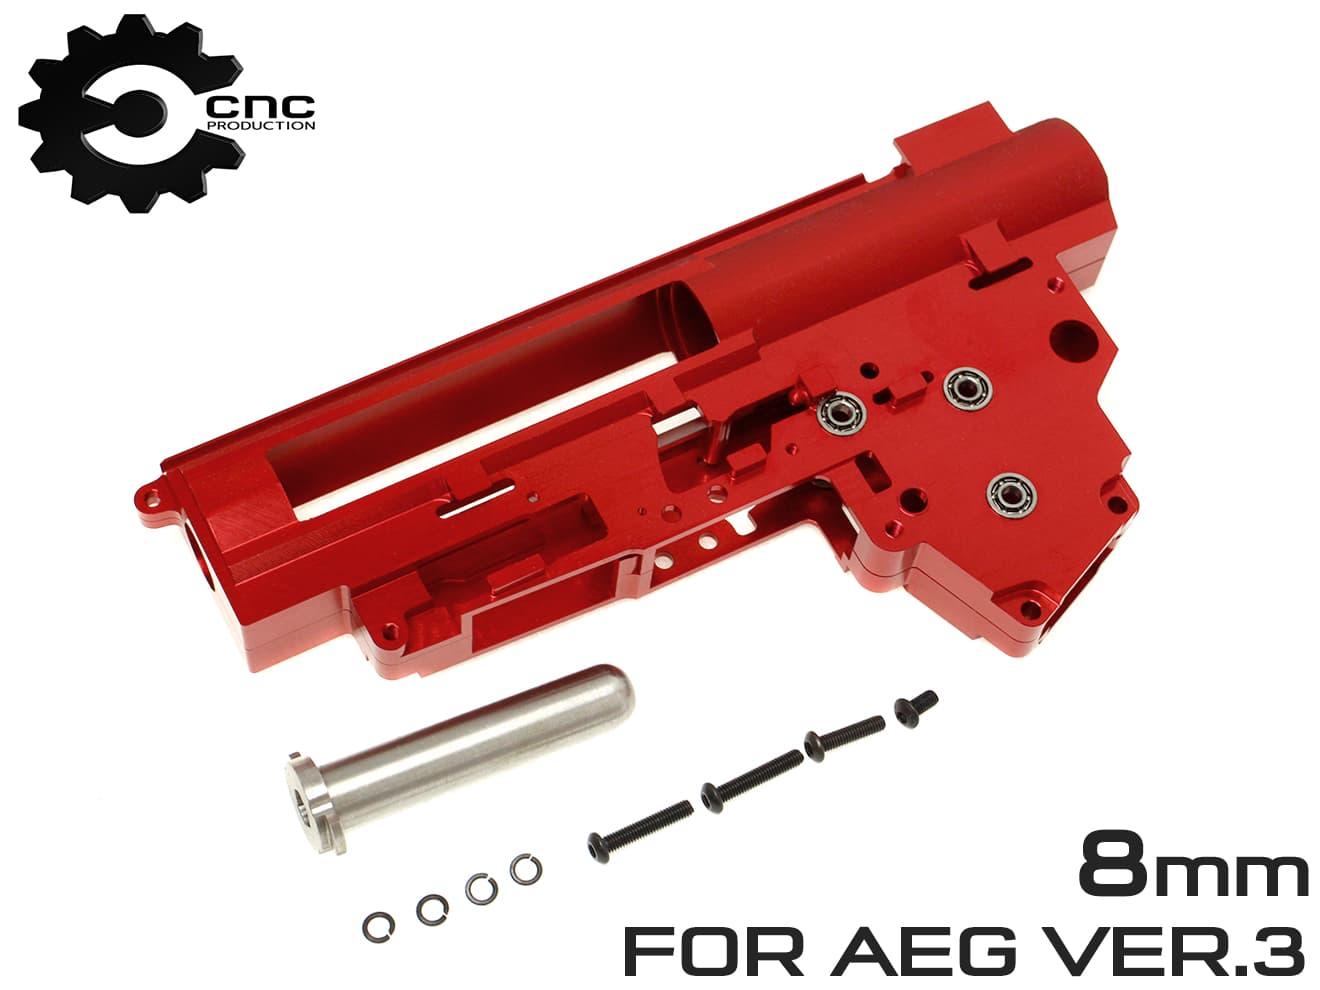 CNC Production A6063 CNC QDメカボックス 8mm Ver3◆各社電動ガン Ver3 メカボックス対応 8ミリ ベアリング内蔵 高強度 強化カスタム